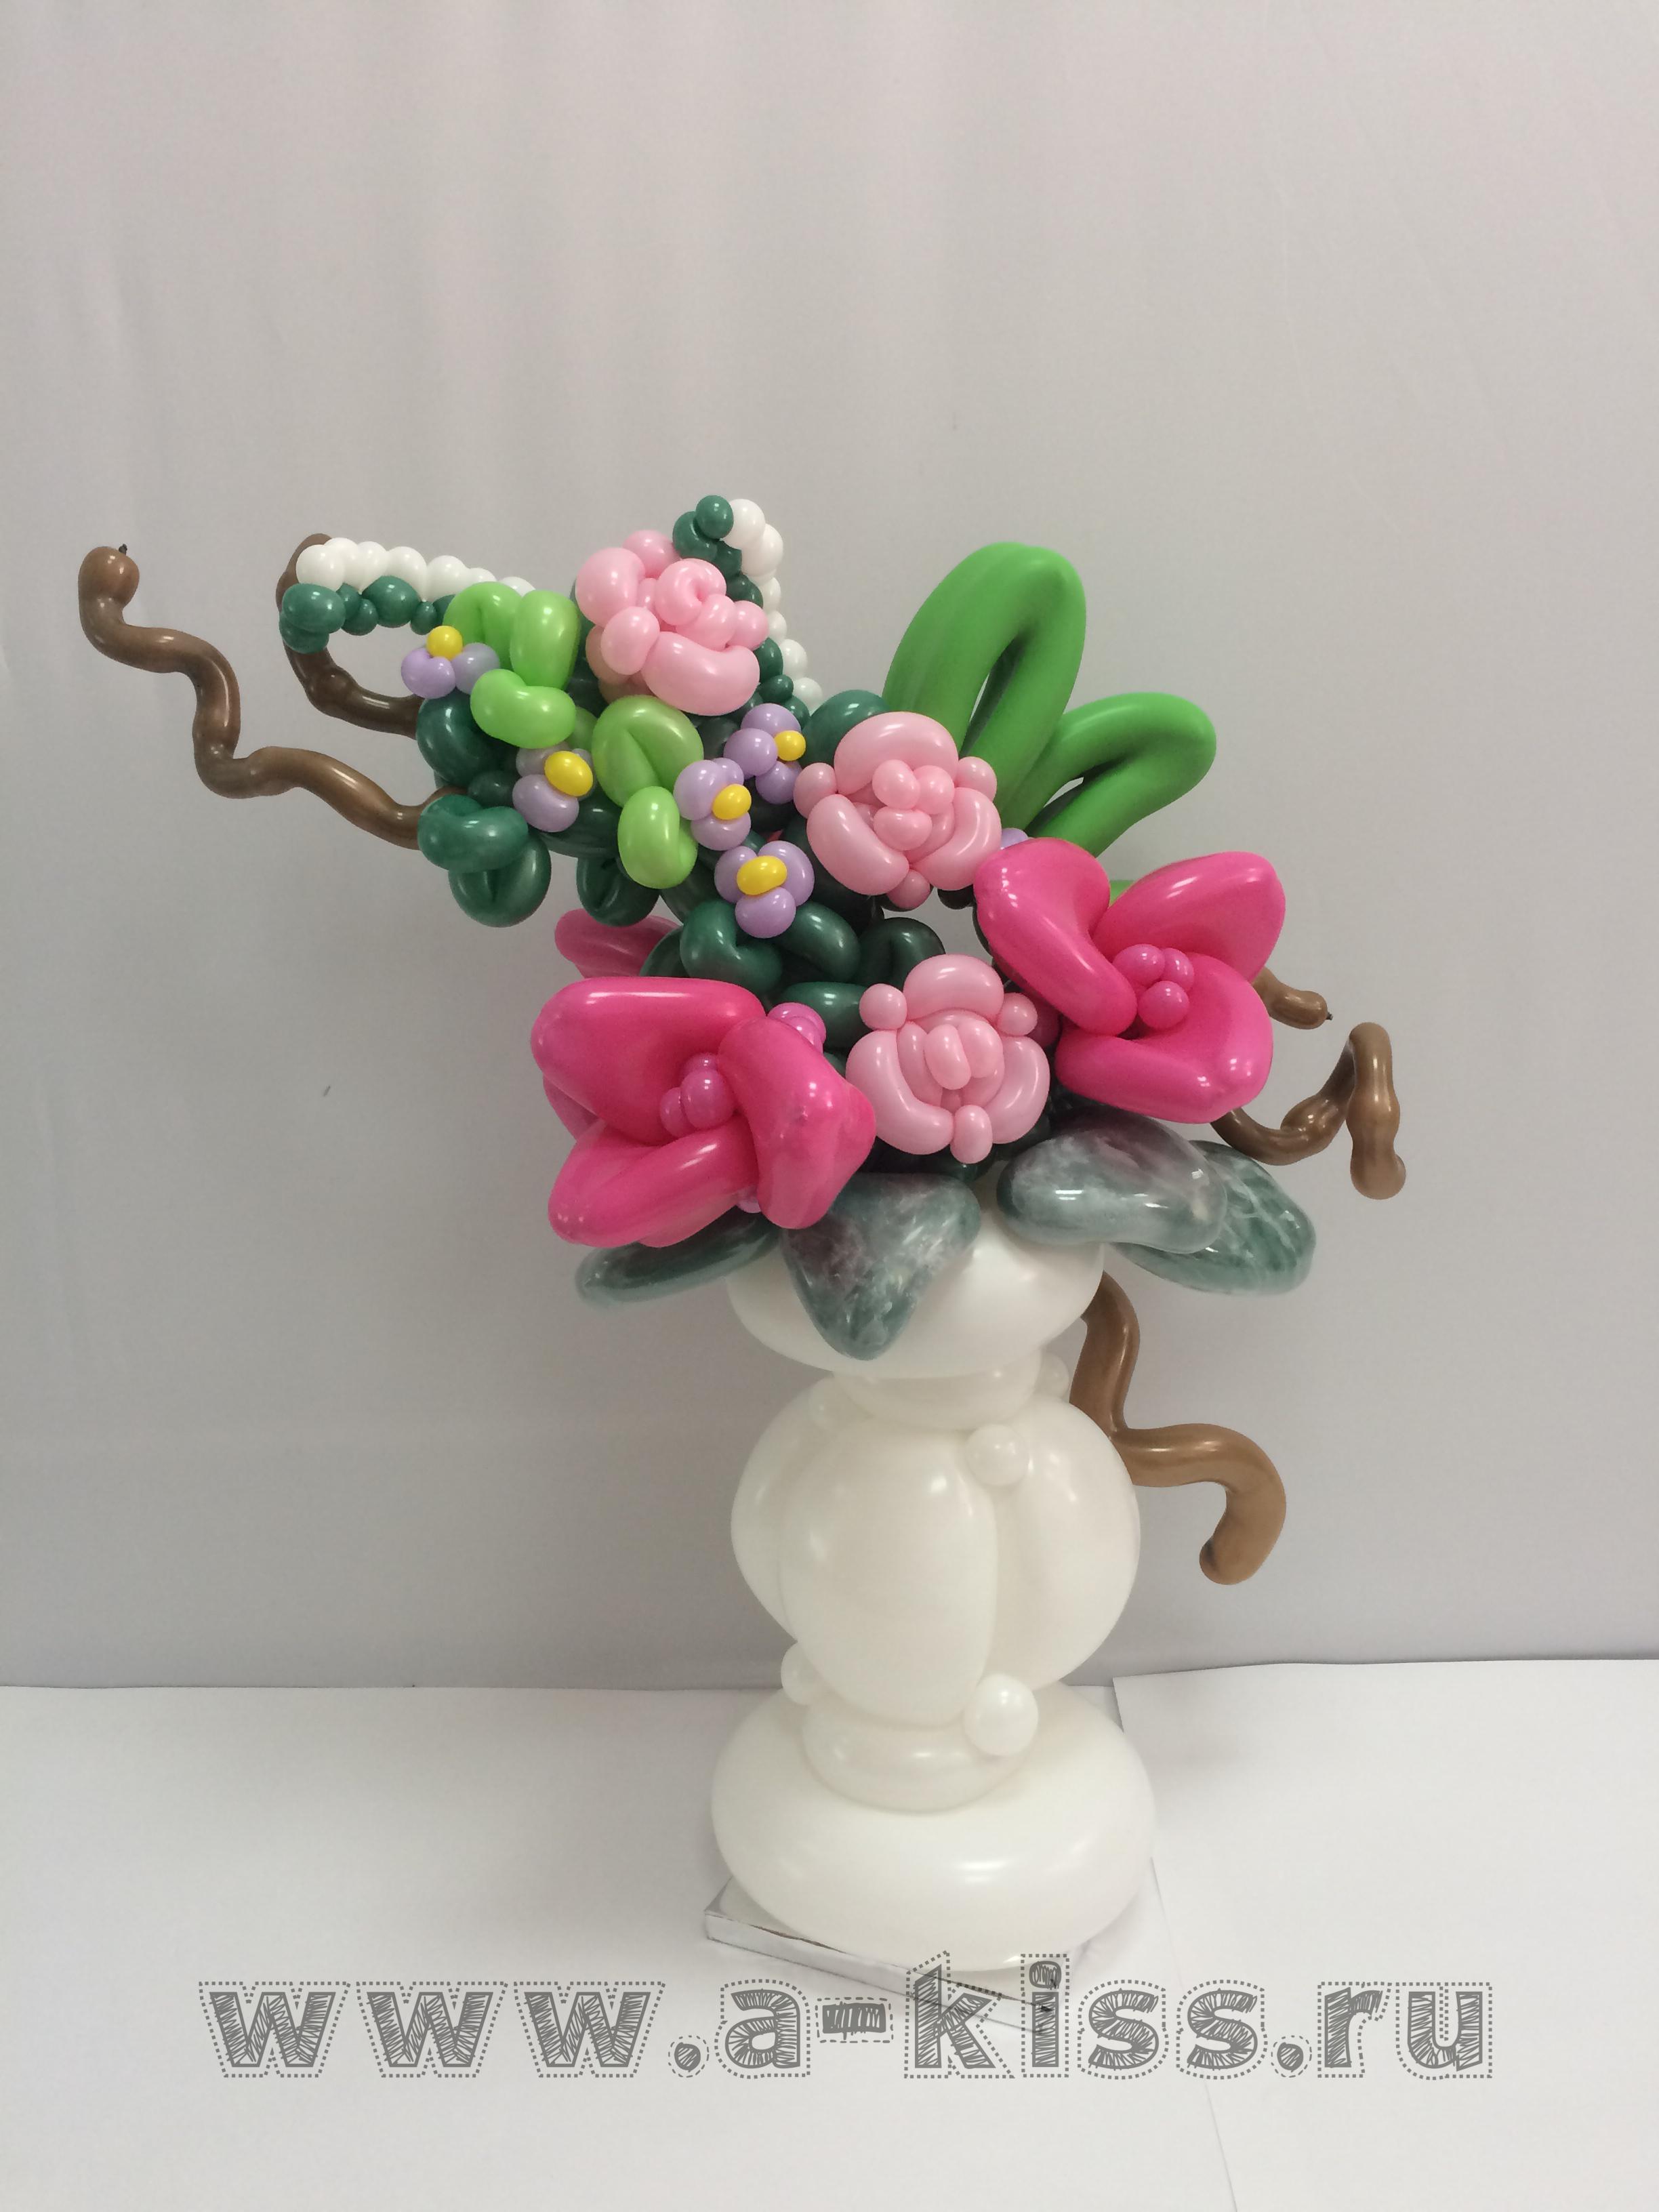 Pin by JORGE ADRIAN TAPIA on flores globo | Pinterest | Balloon ...